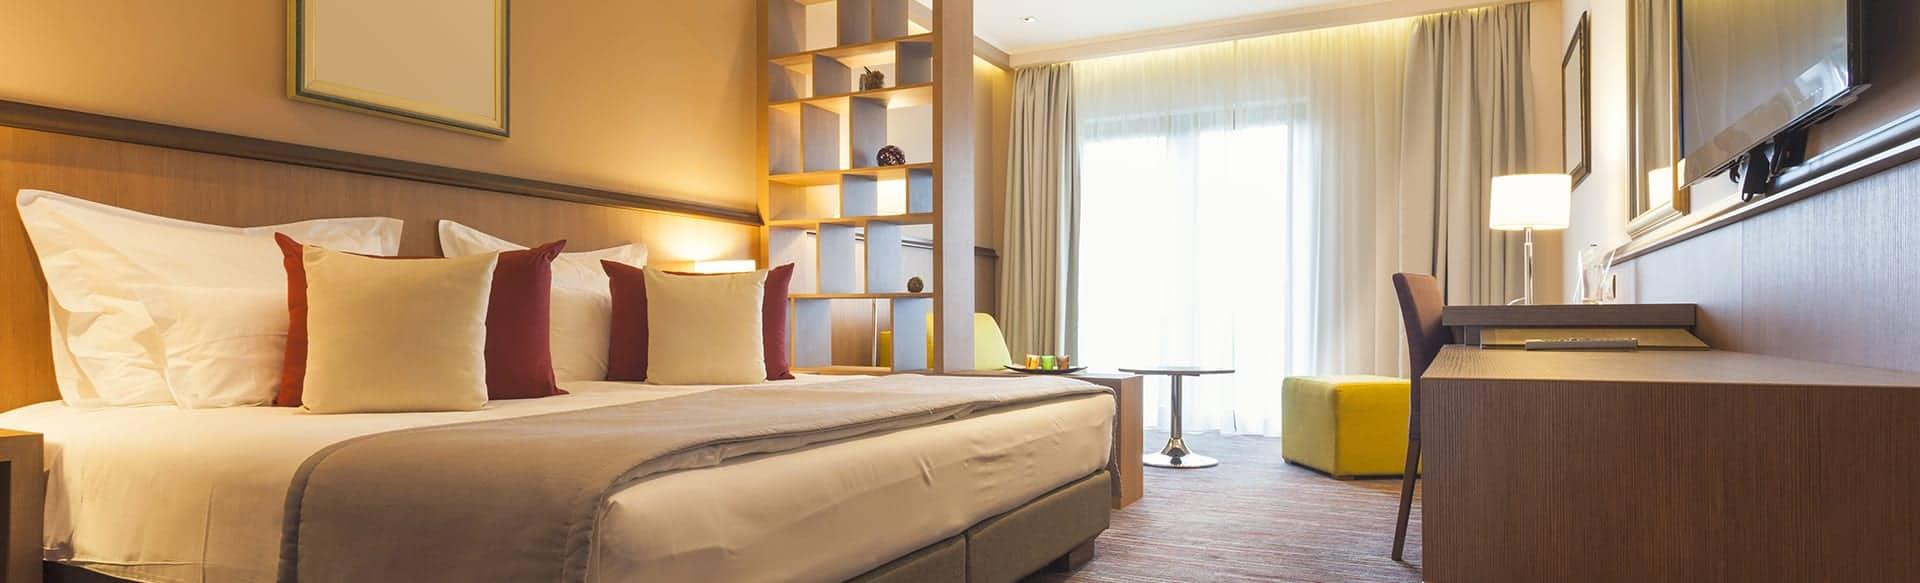 Hotel-Top